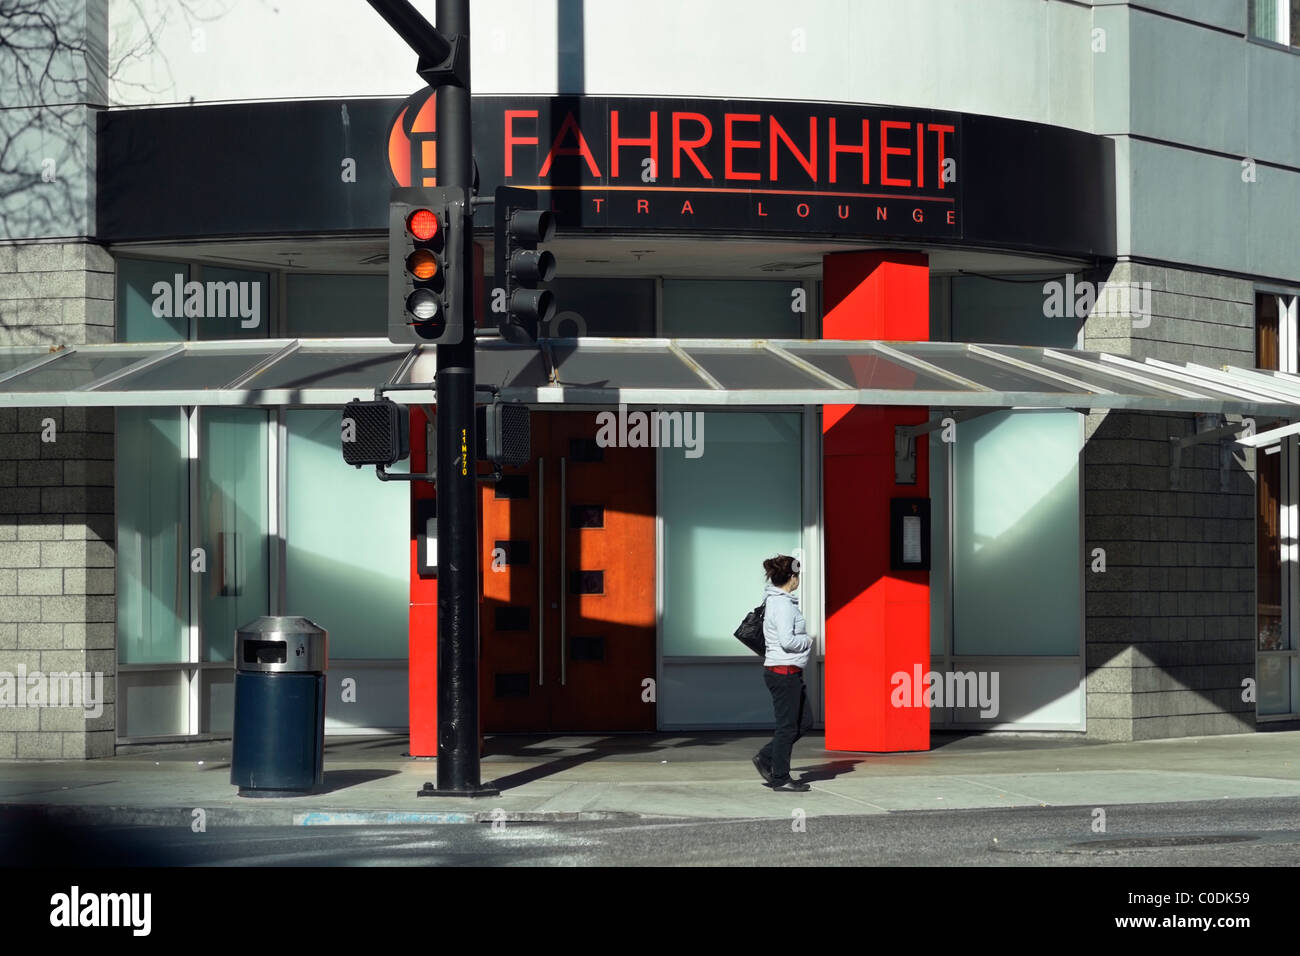 Fahrenheit San Jose speed dating online dating Ottawa Ontario